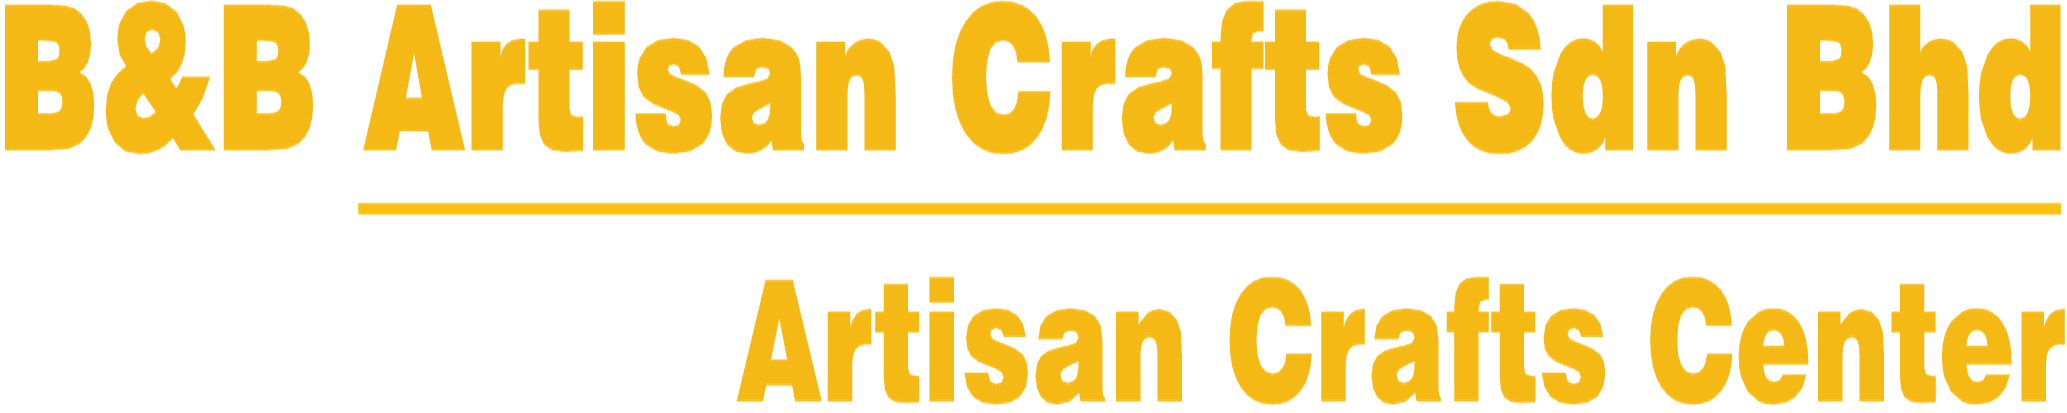 B&B Artisan Crafts Center - 婆罗洲の祝福手工艺品文化馆